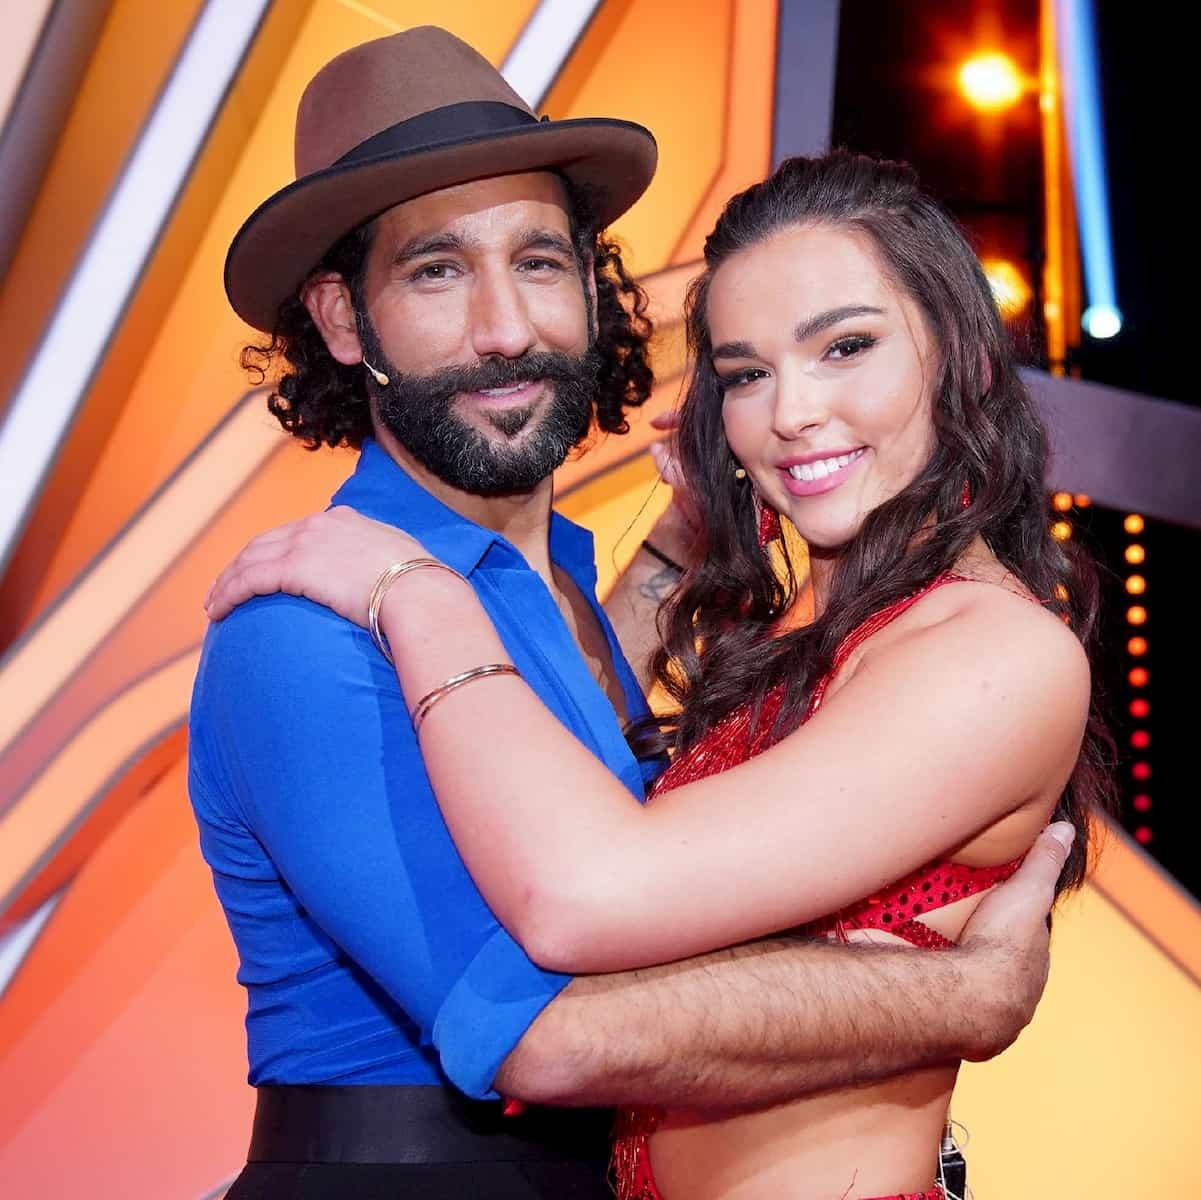 Massimo Sinato und Lili Paul Roncalli als Tanzpaar bei Let's dance 2020